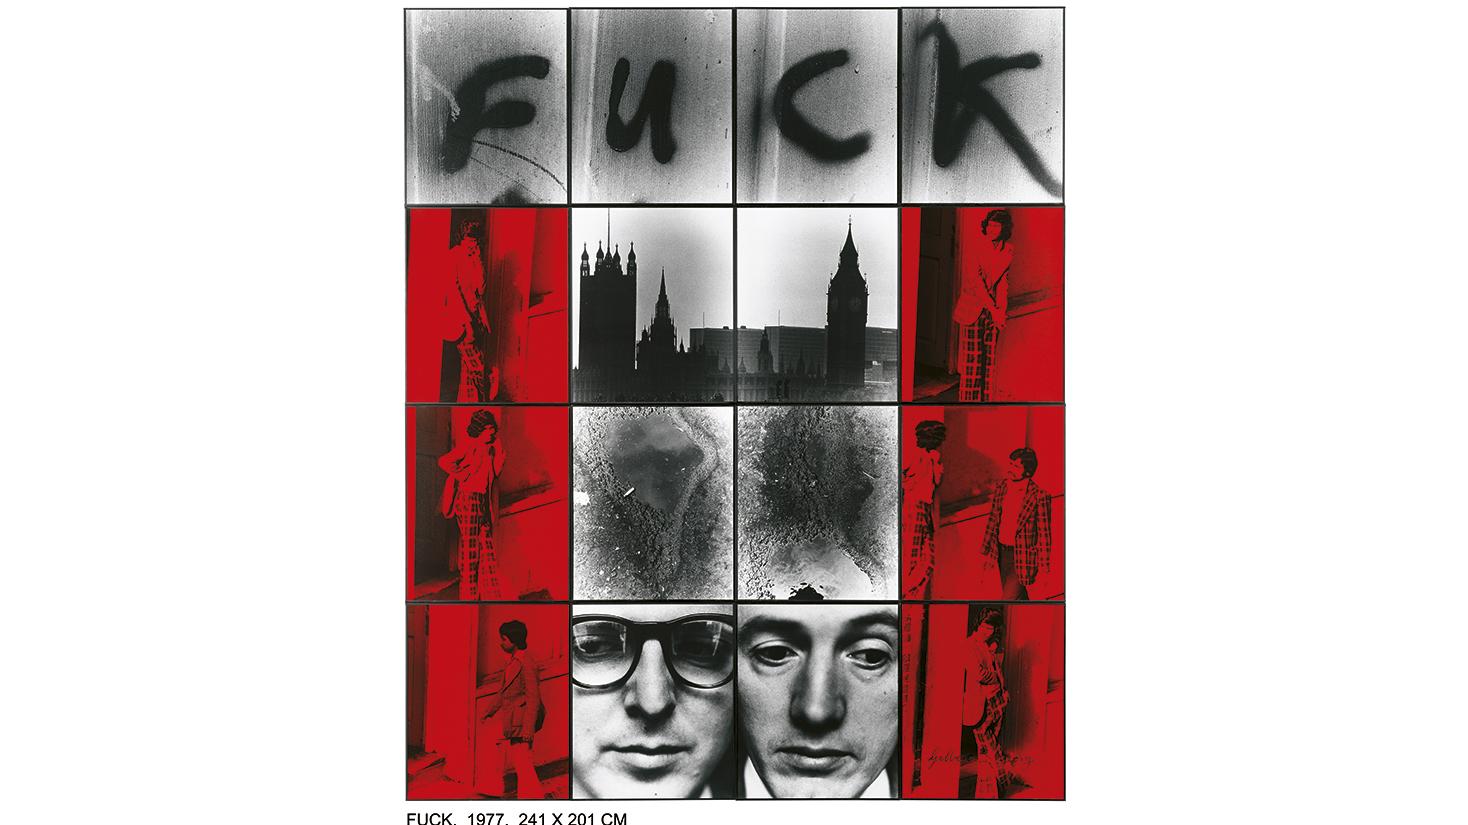 Gilbert & George, Fuck, 1977